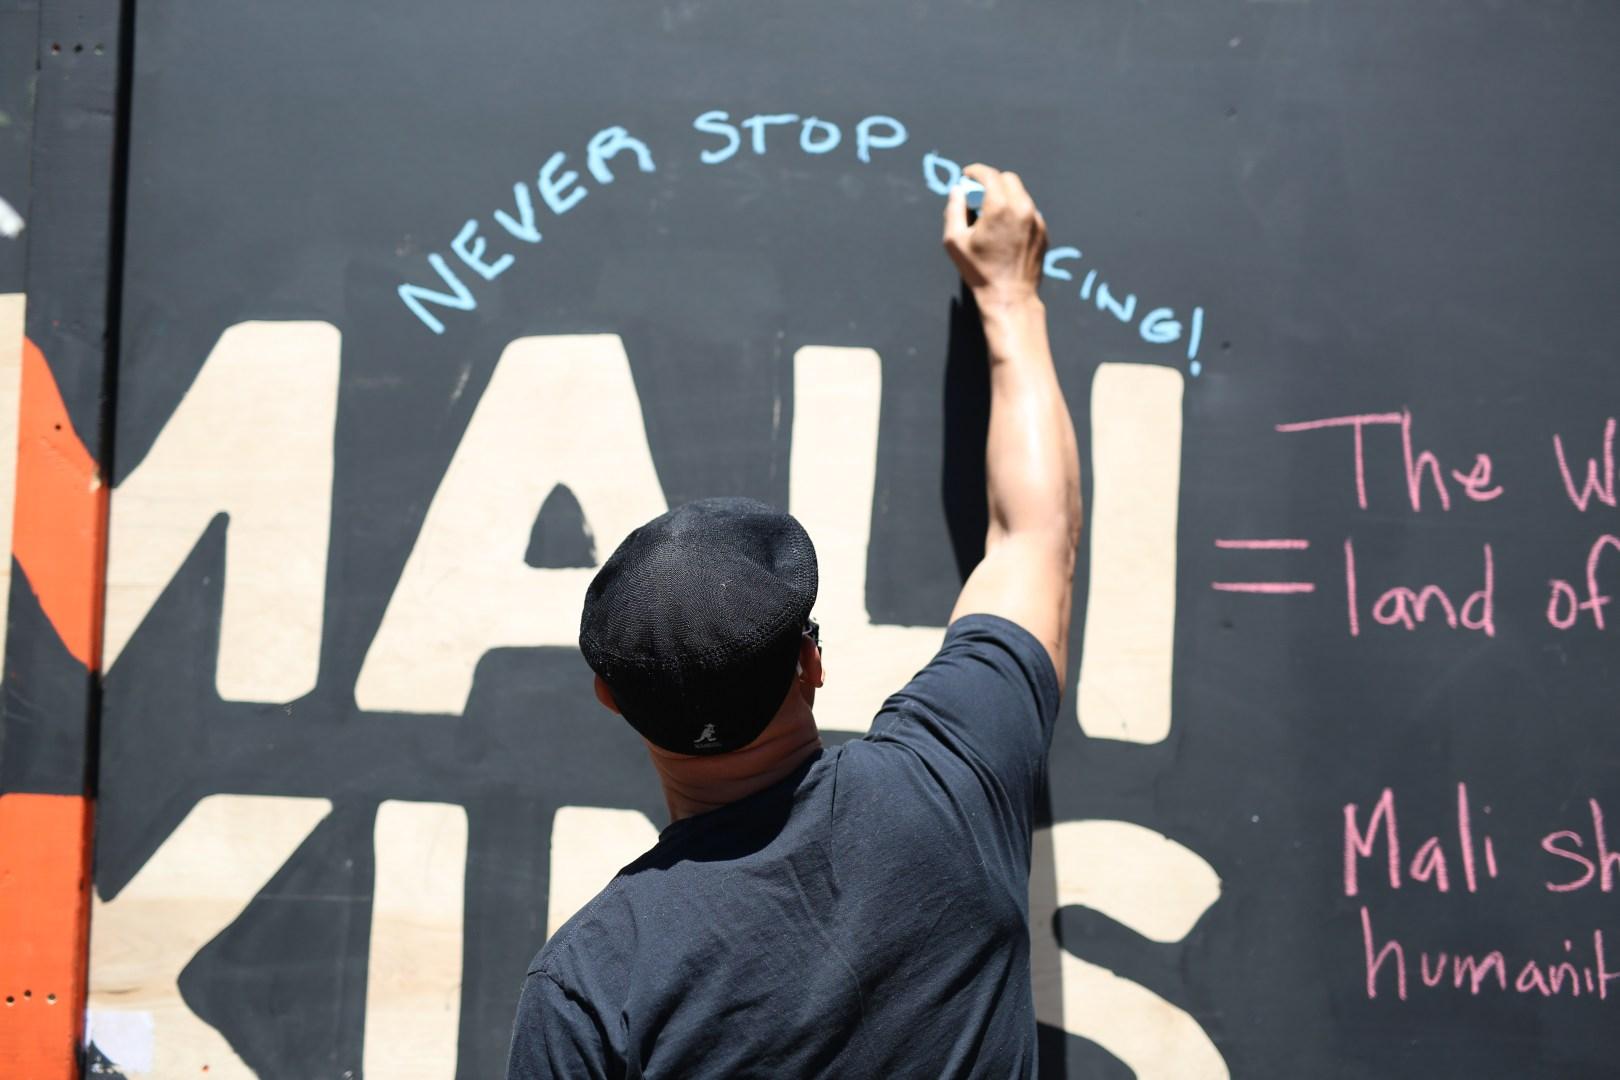 Man writes on interactive art installation dedicated to Mali Watkins and Black Lives Matter. Photo courtesy of Walter Wallace.